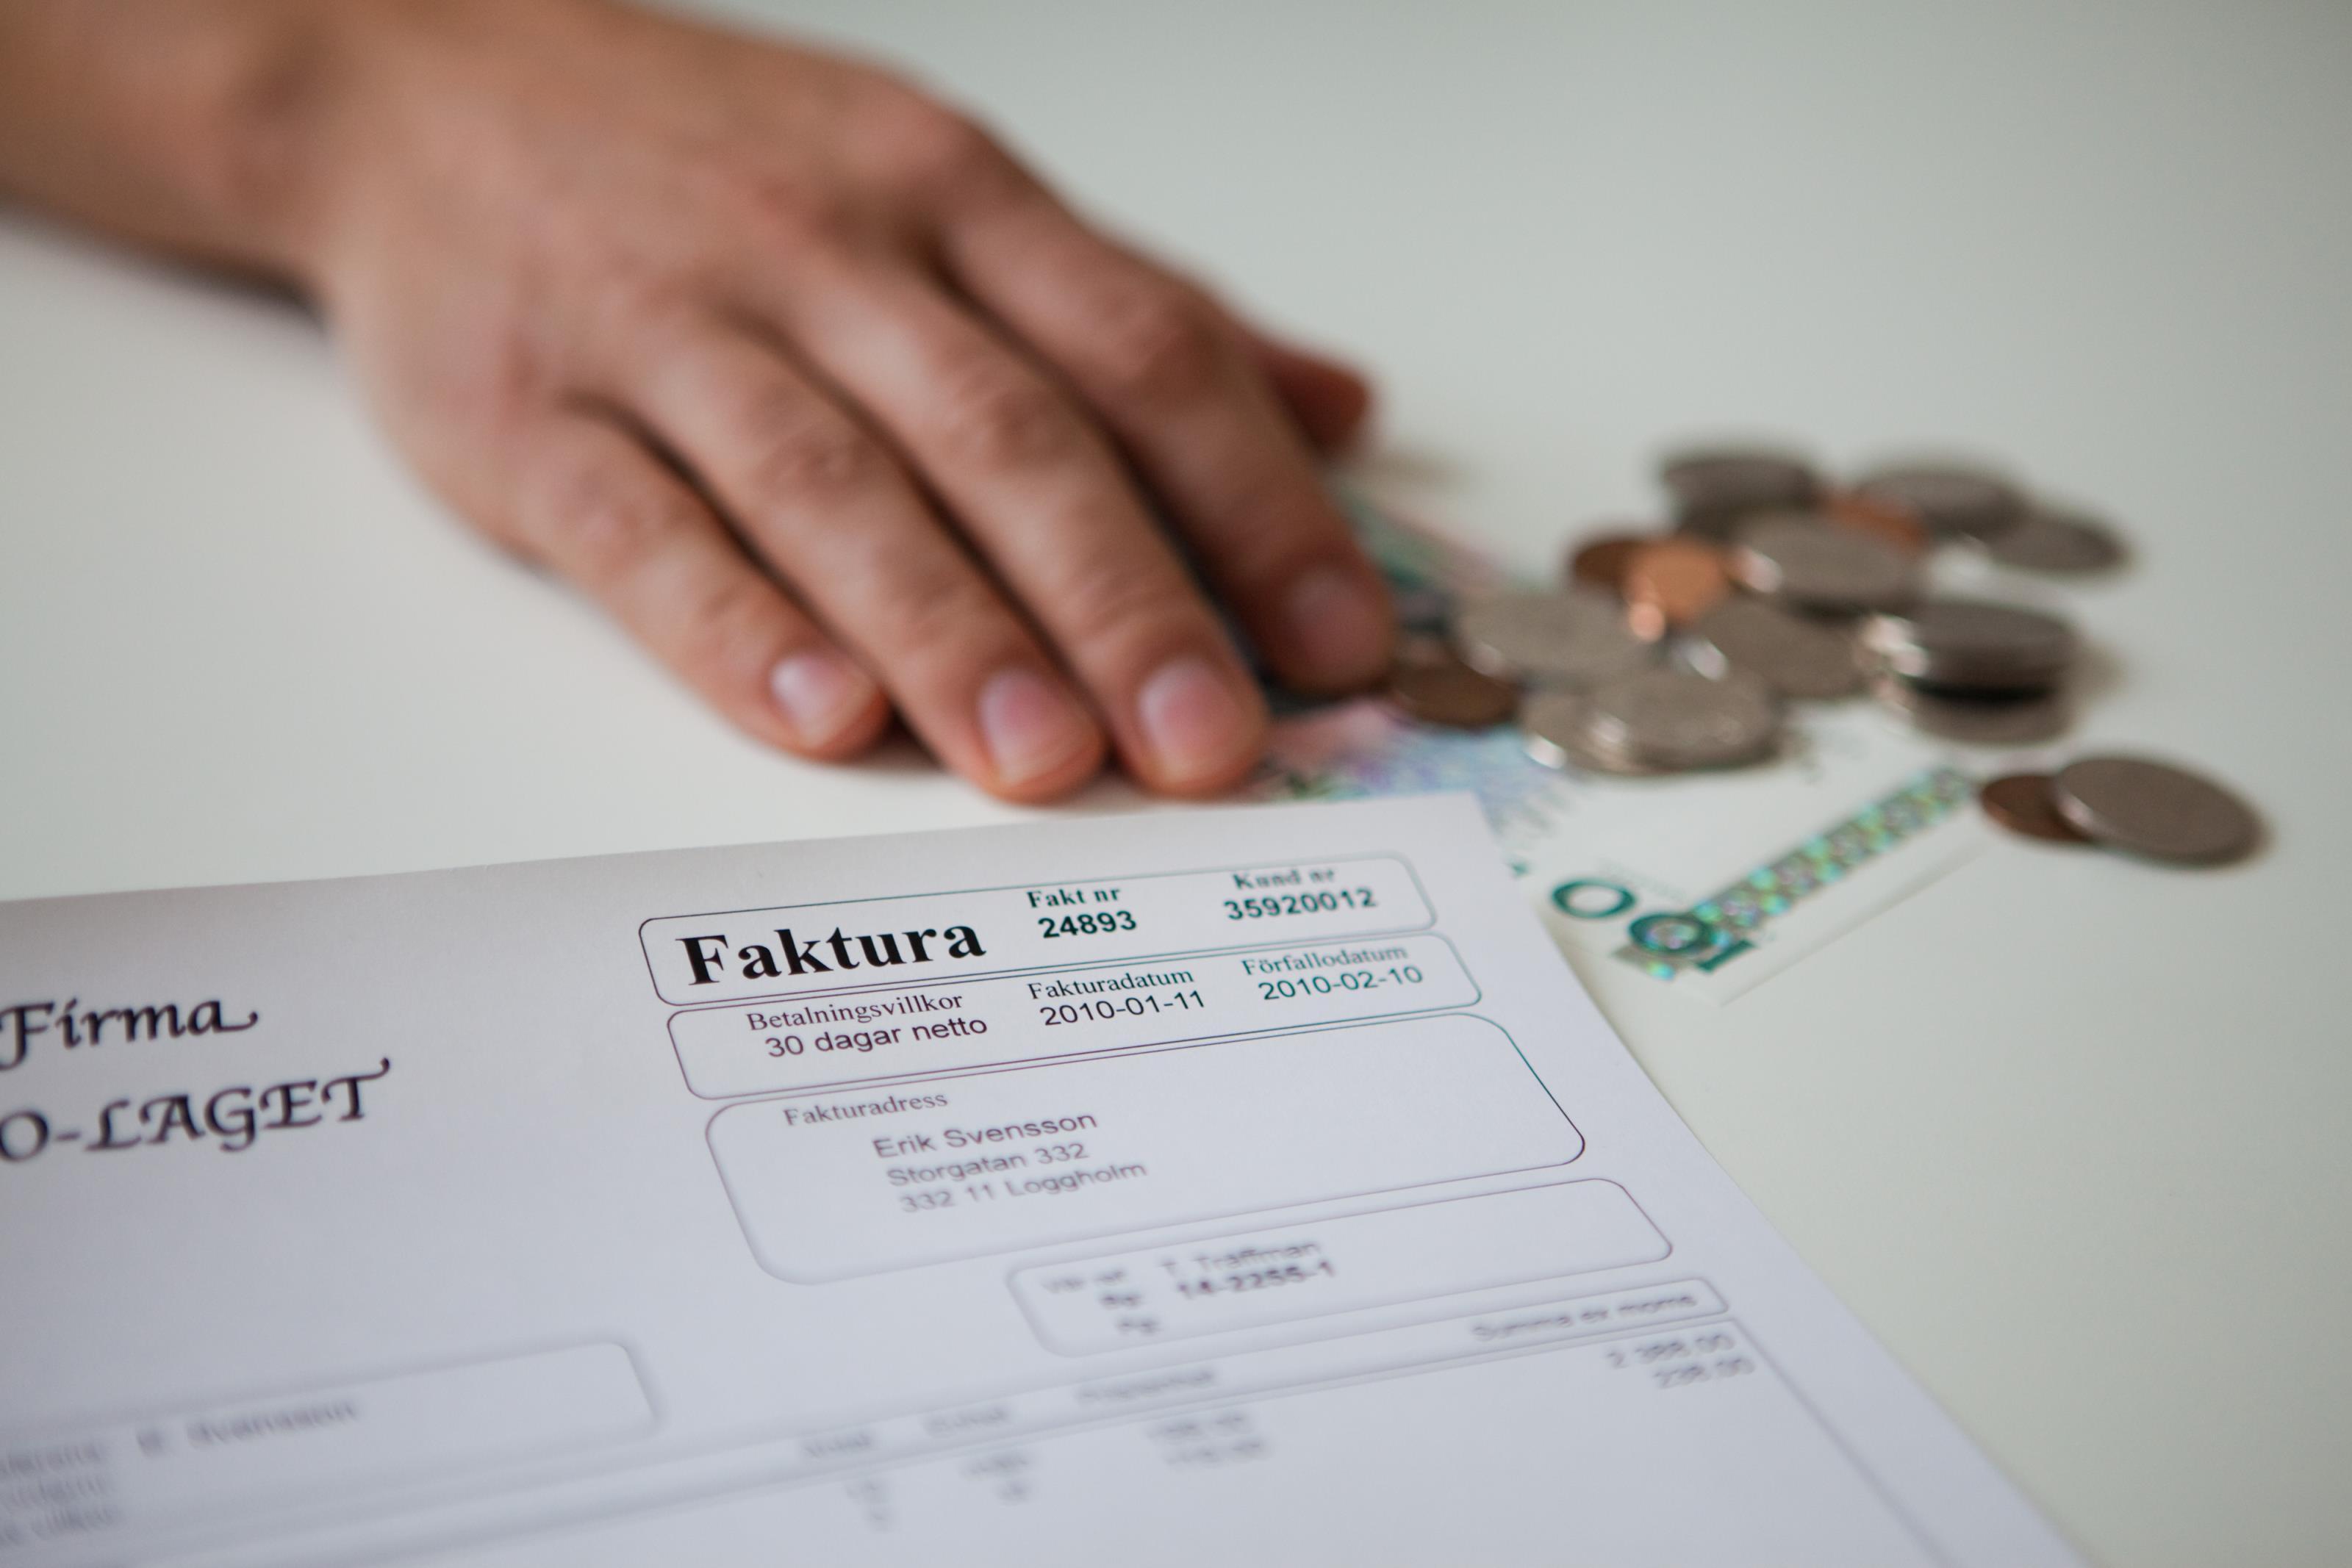 Roulette spel köpa kontanter australien